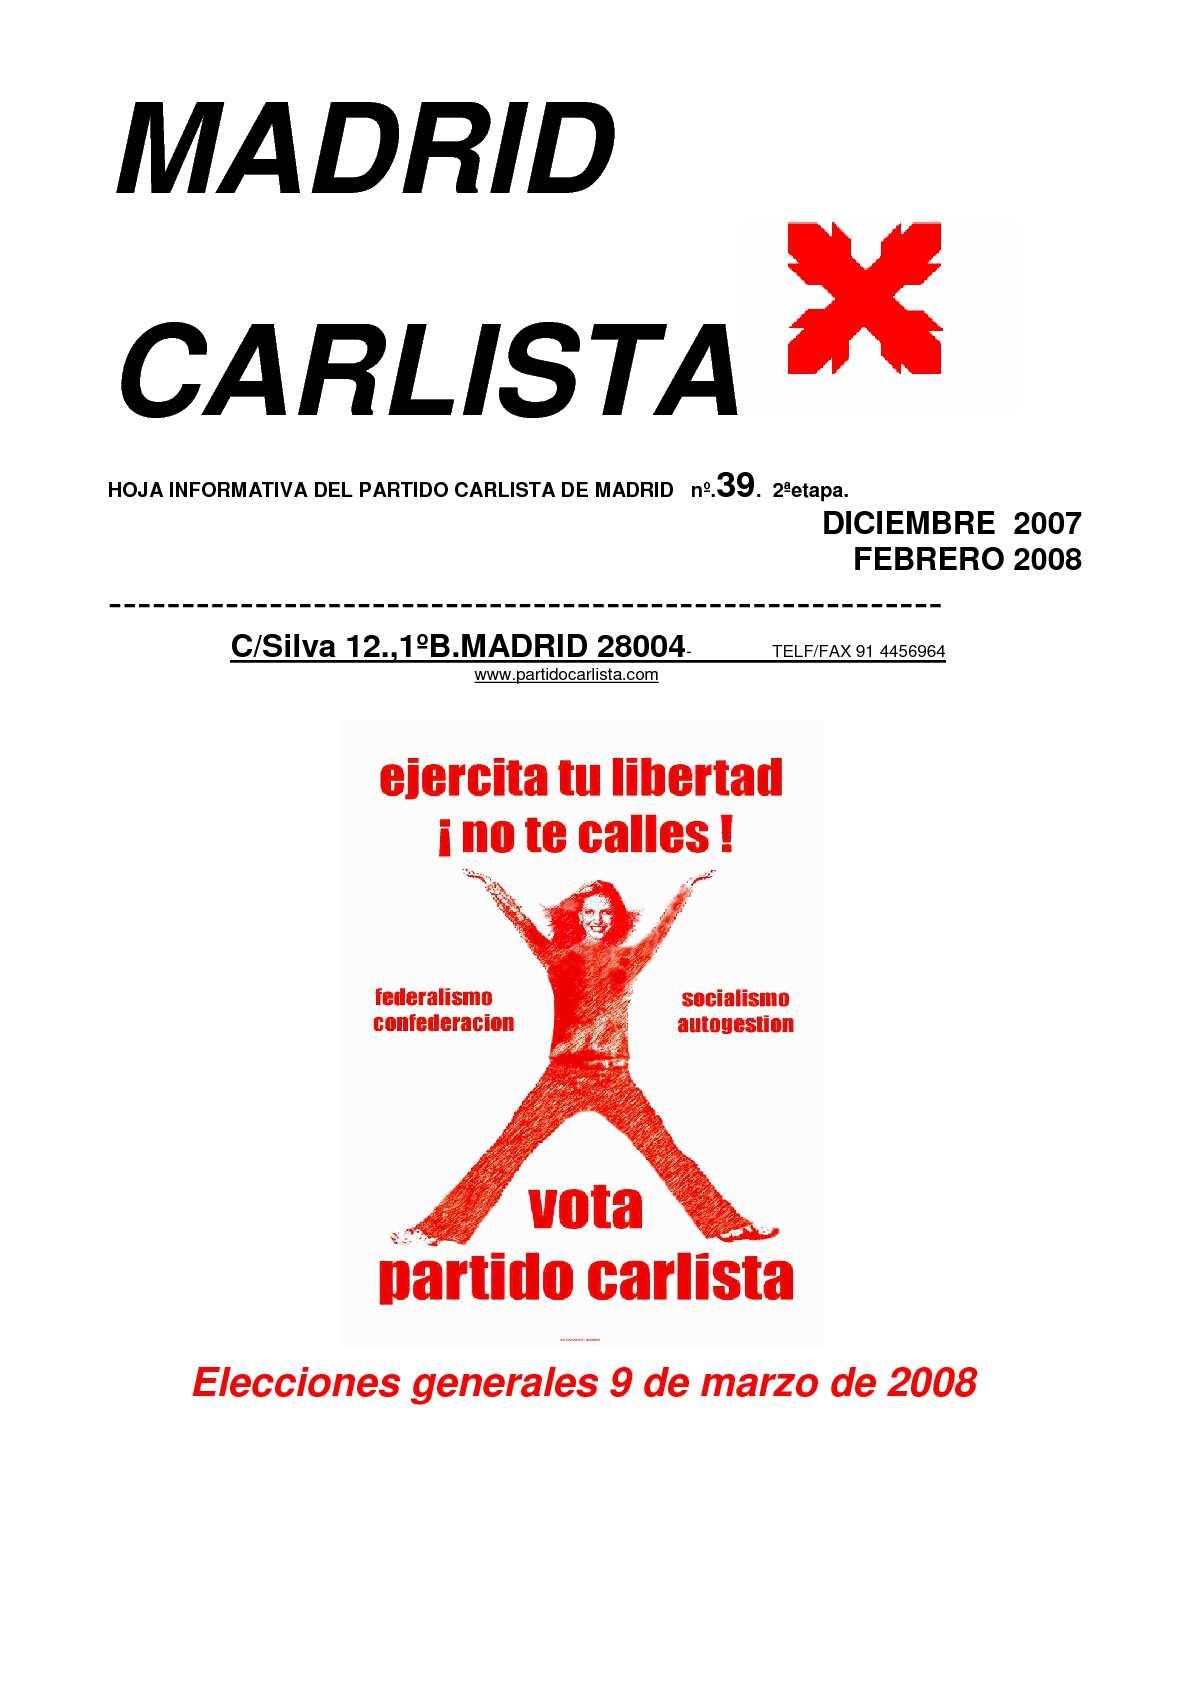 Calaméo - MADRID CARLISTA PCM 39